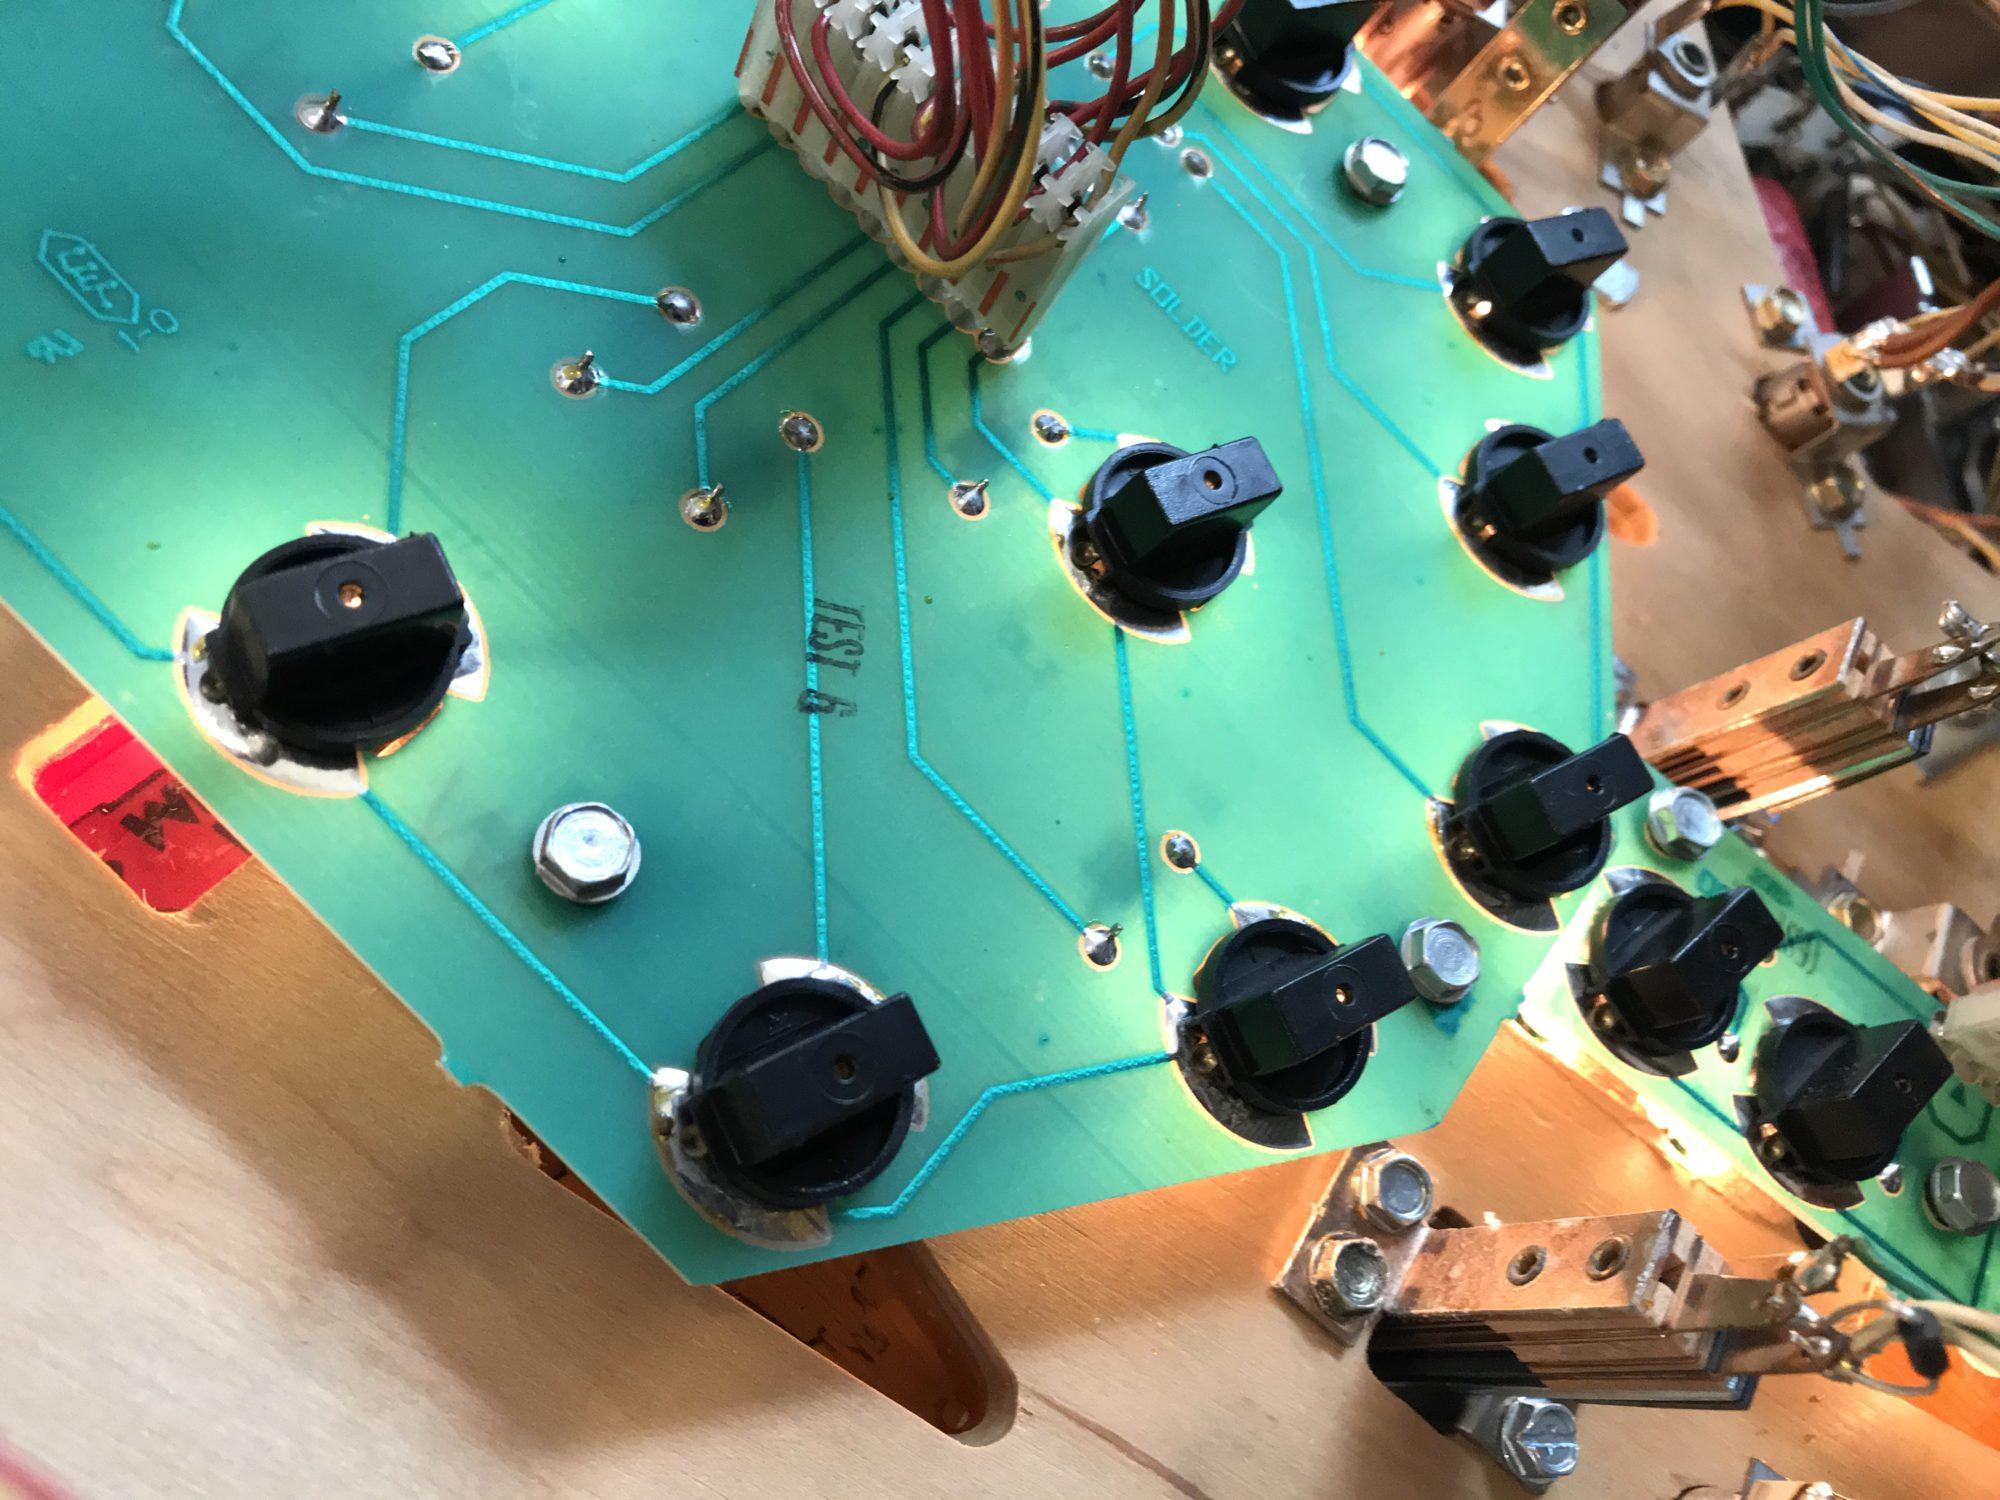 Repair Those Flickering Pinball Lamp Sockets Maintenance Tools Fixture Circuit Board Containing Lamps